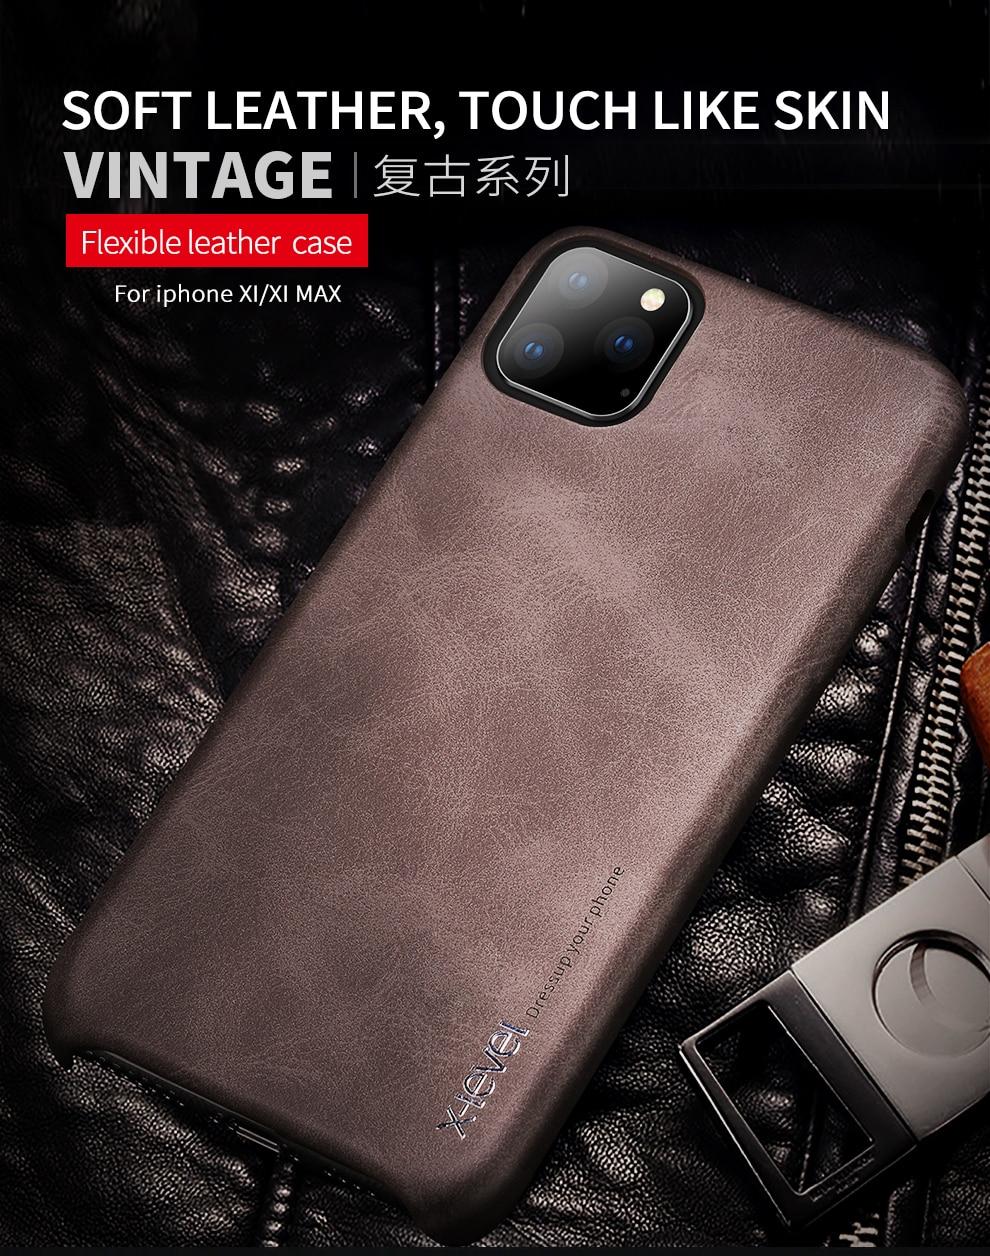 H18e9e643cb7248f6888ce29e080879a29 X-Level Leather Case For iPhone 11 Pro Max Luxury Ultra Light Retro Back Phone Cover For iPhone 11 Pro Case Coque iPhone11